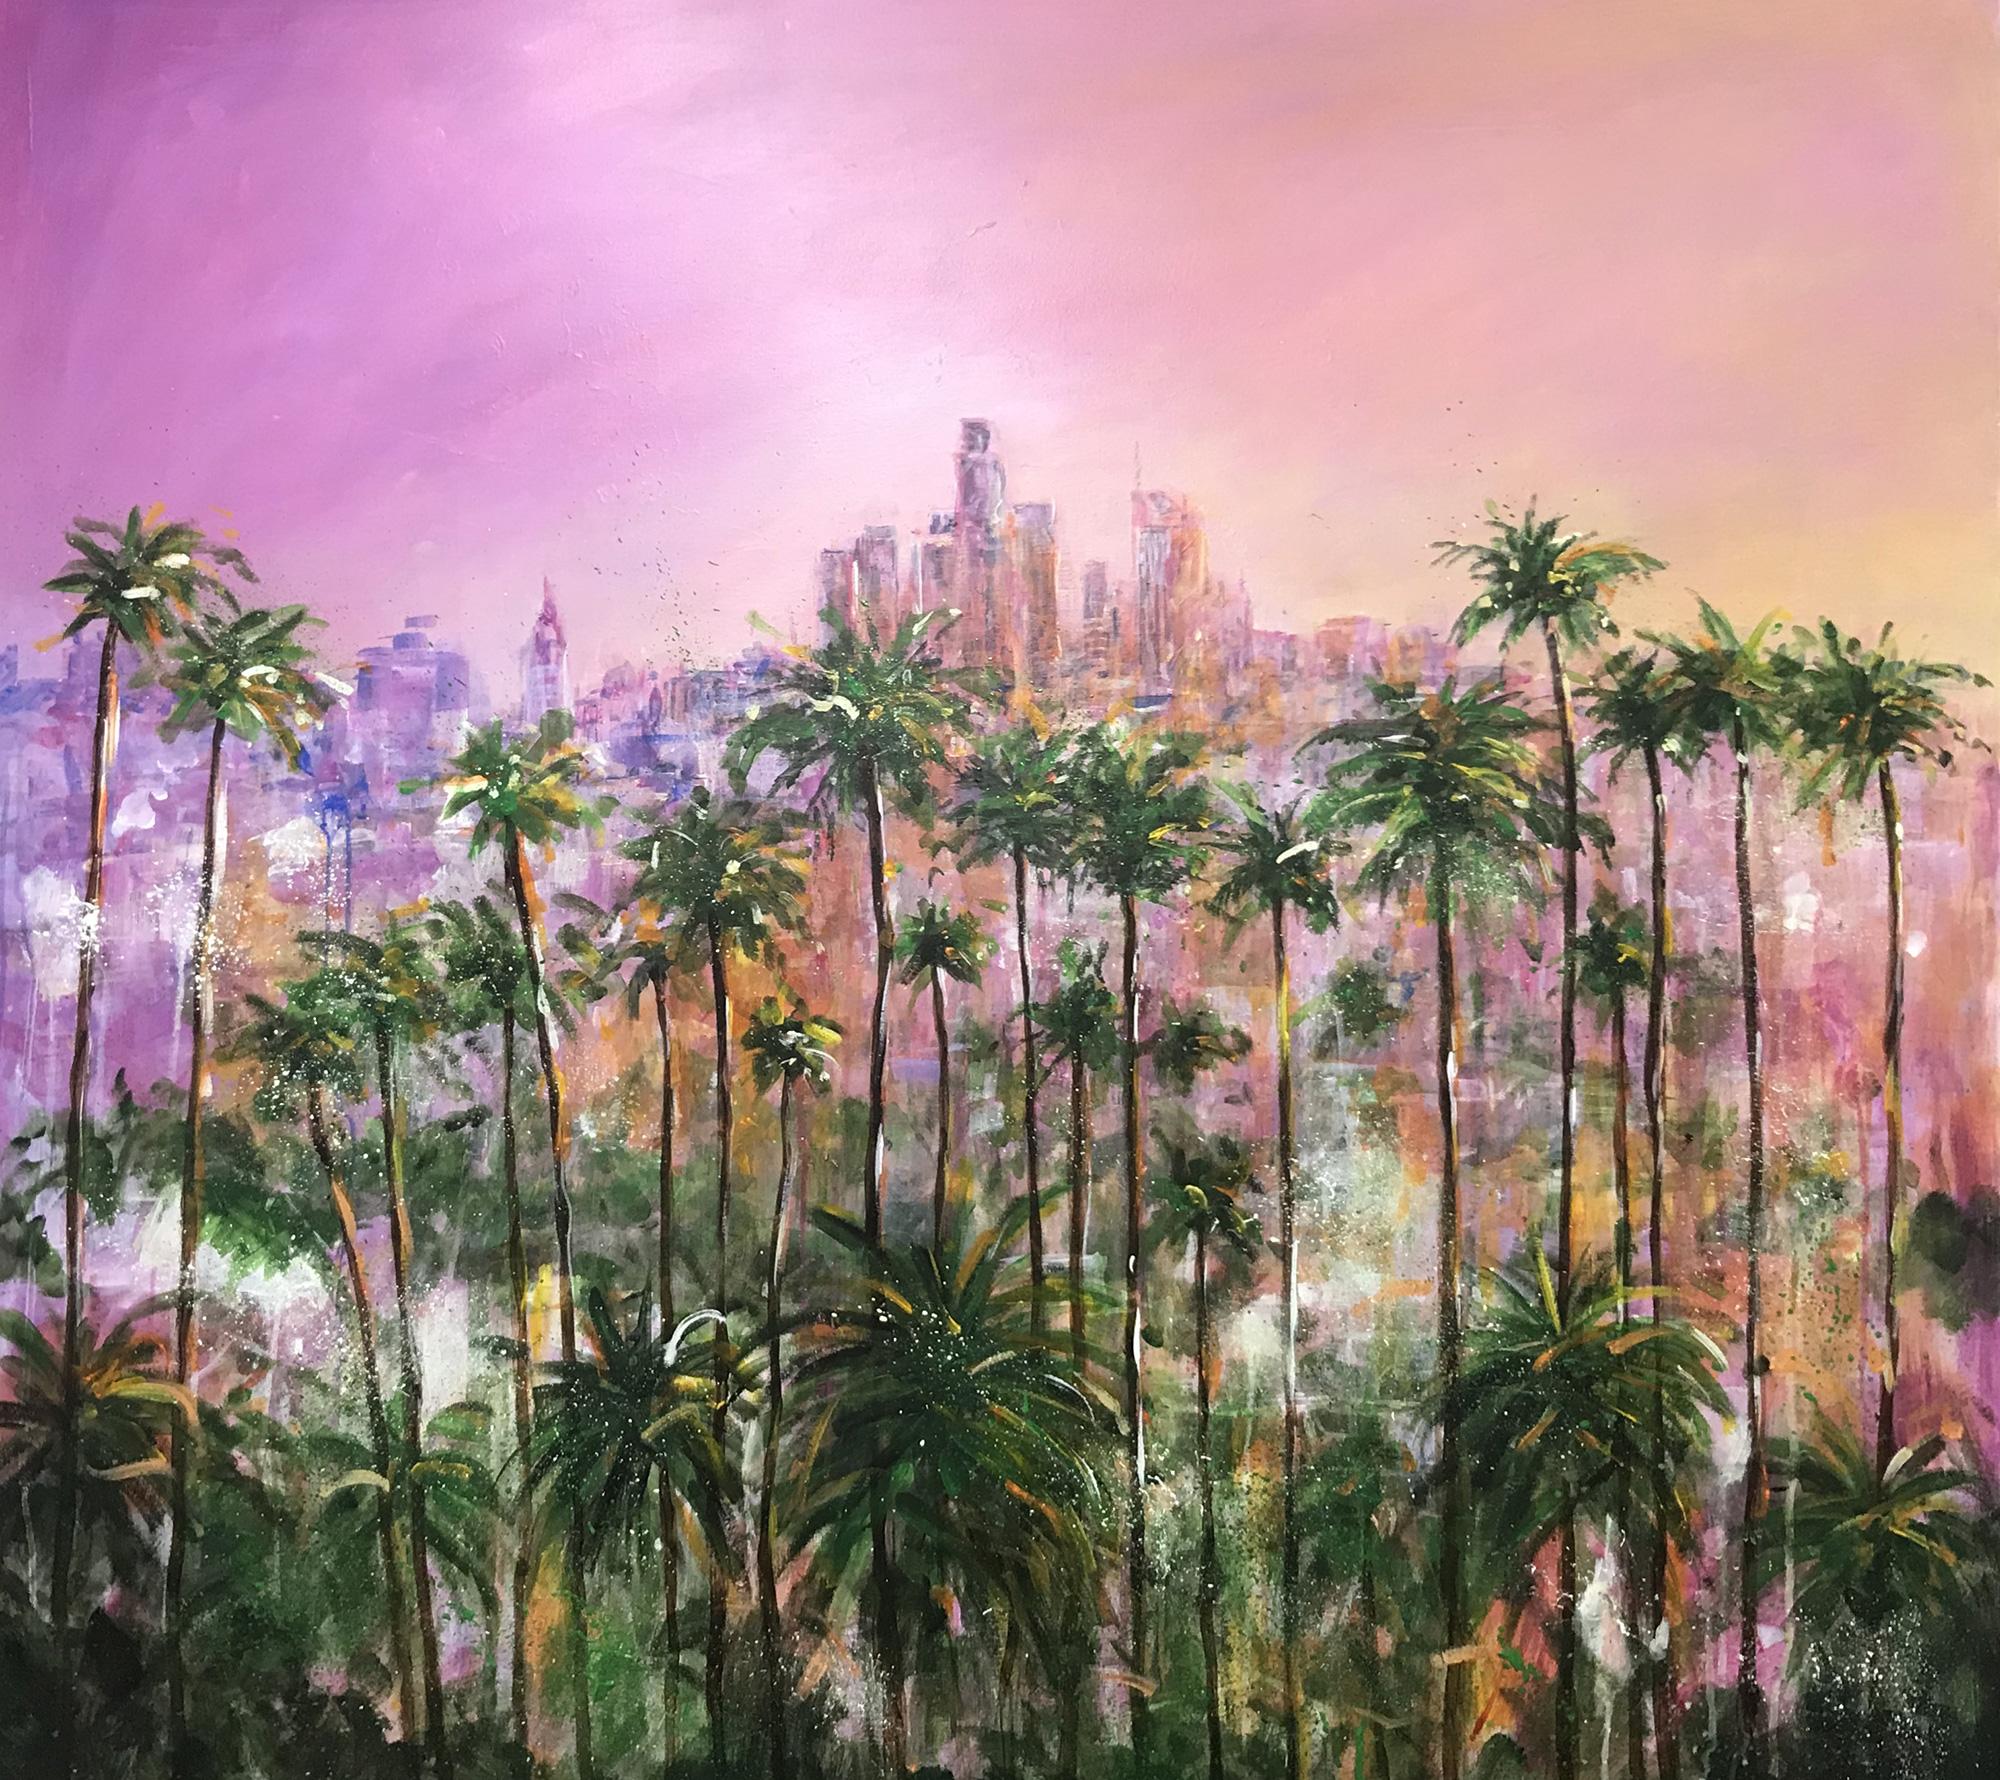 L.A Skyline painting at dusk - Artist Ewen Macaulay